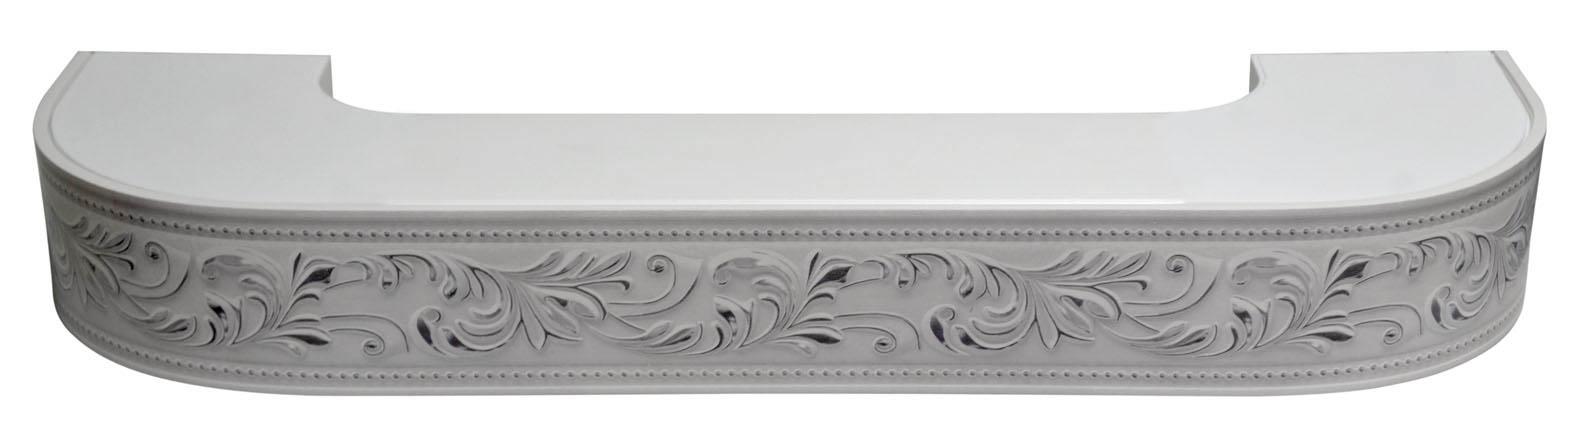 Карнизы и аксессуары для штор ARCODORO Карниз Овация Цвет: Белый Хром (400 см)